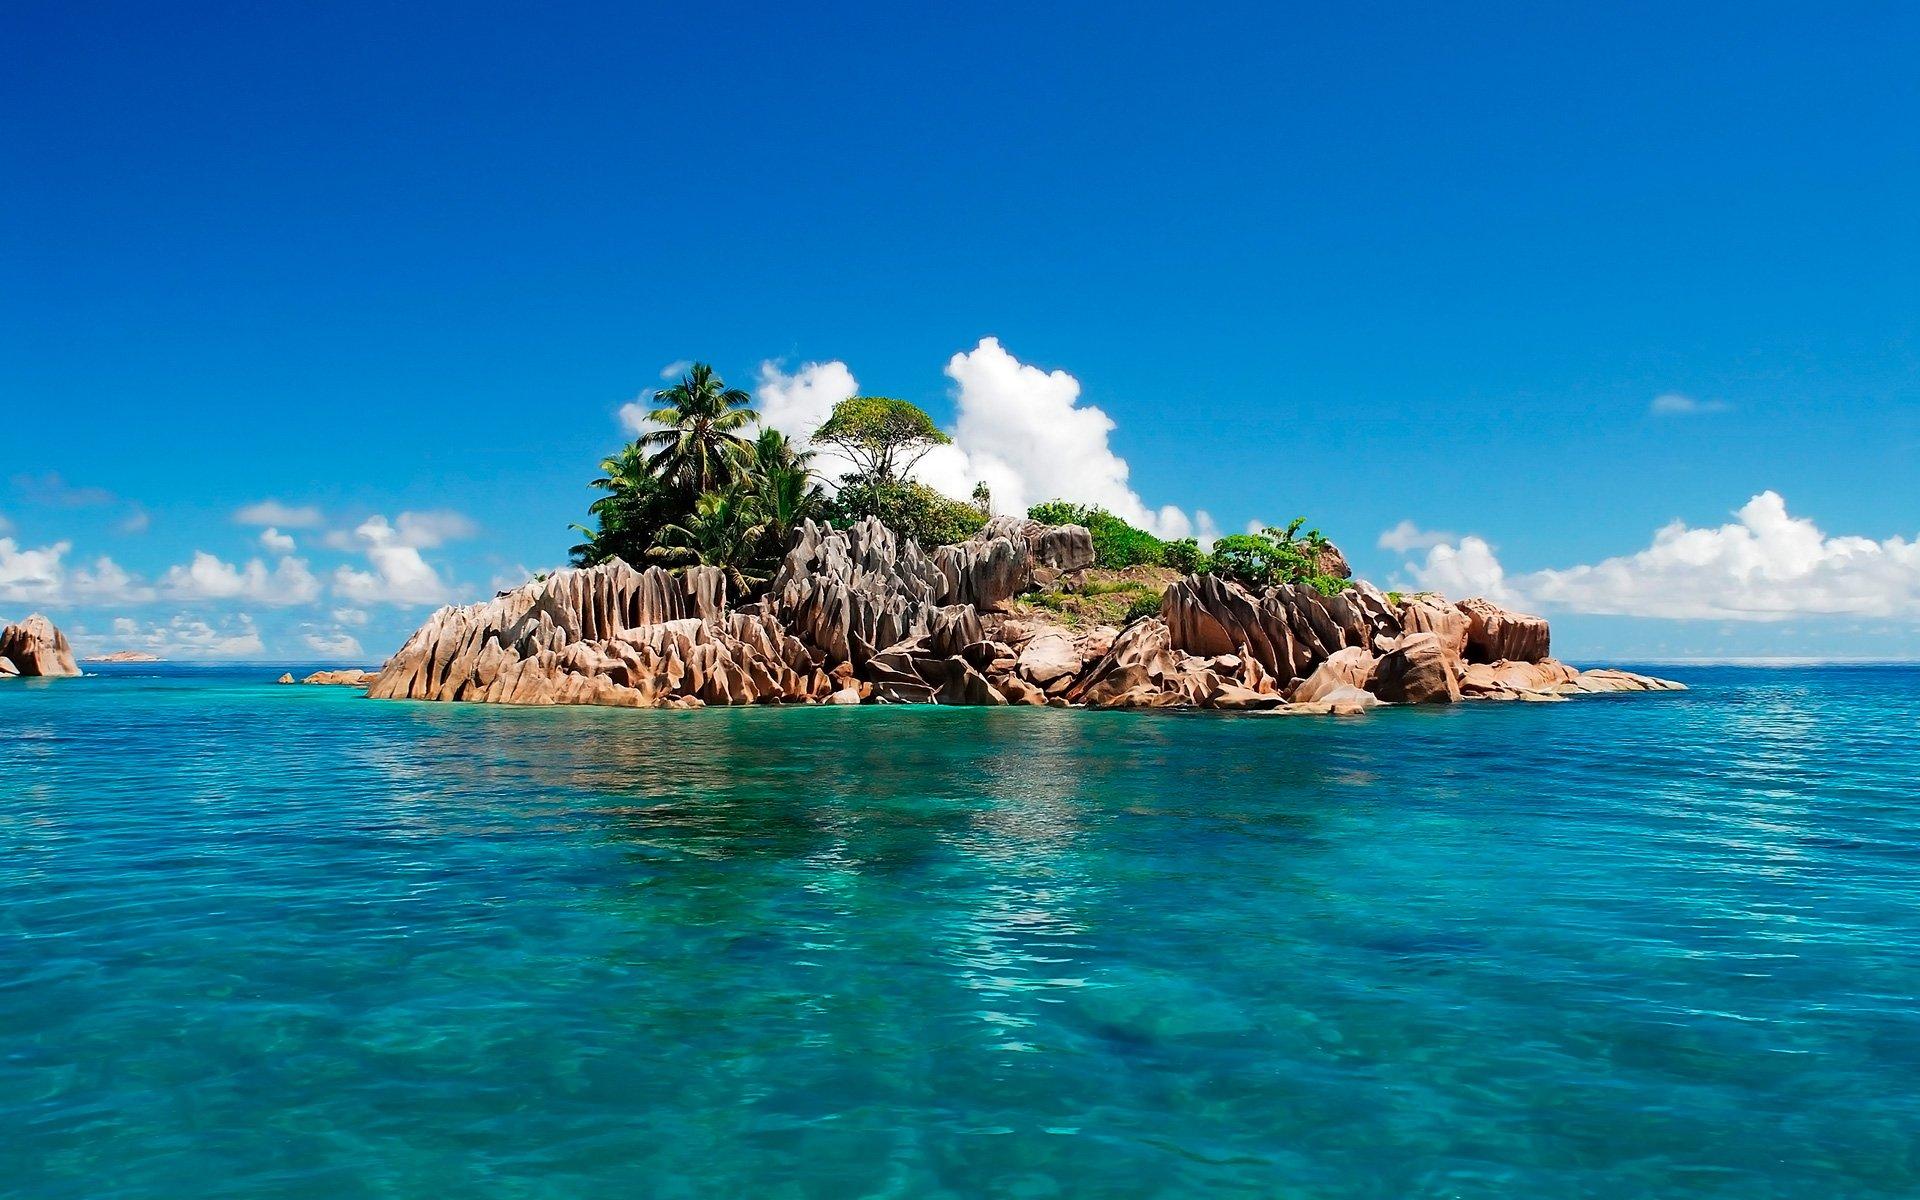 Island HD Wallpapers Desktop Pics – One HD Wallpaper ...